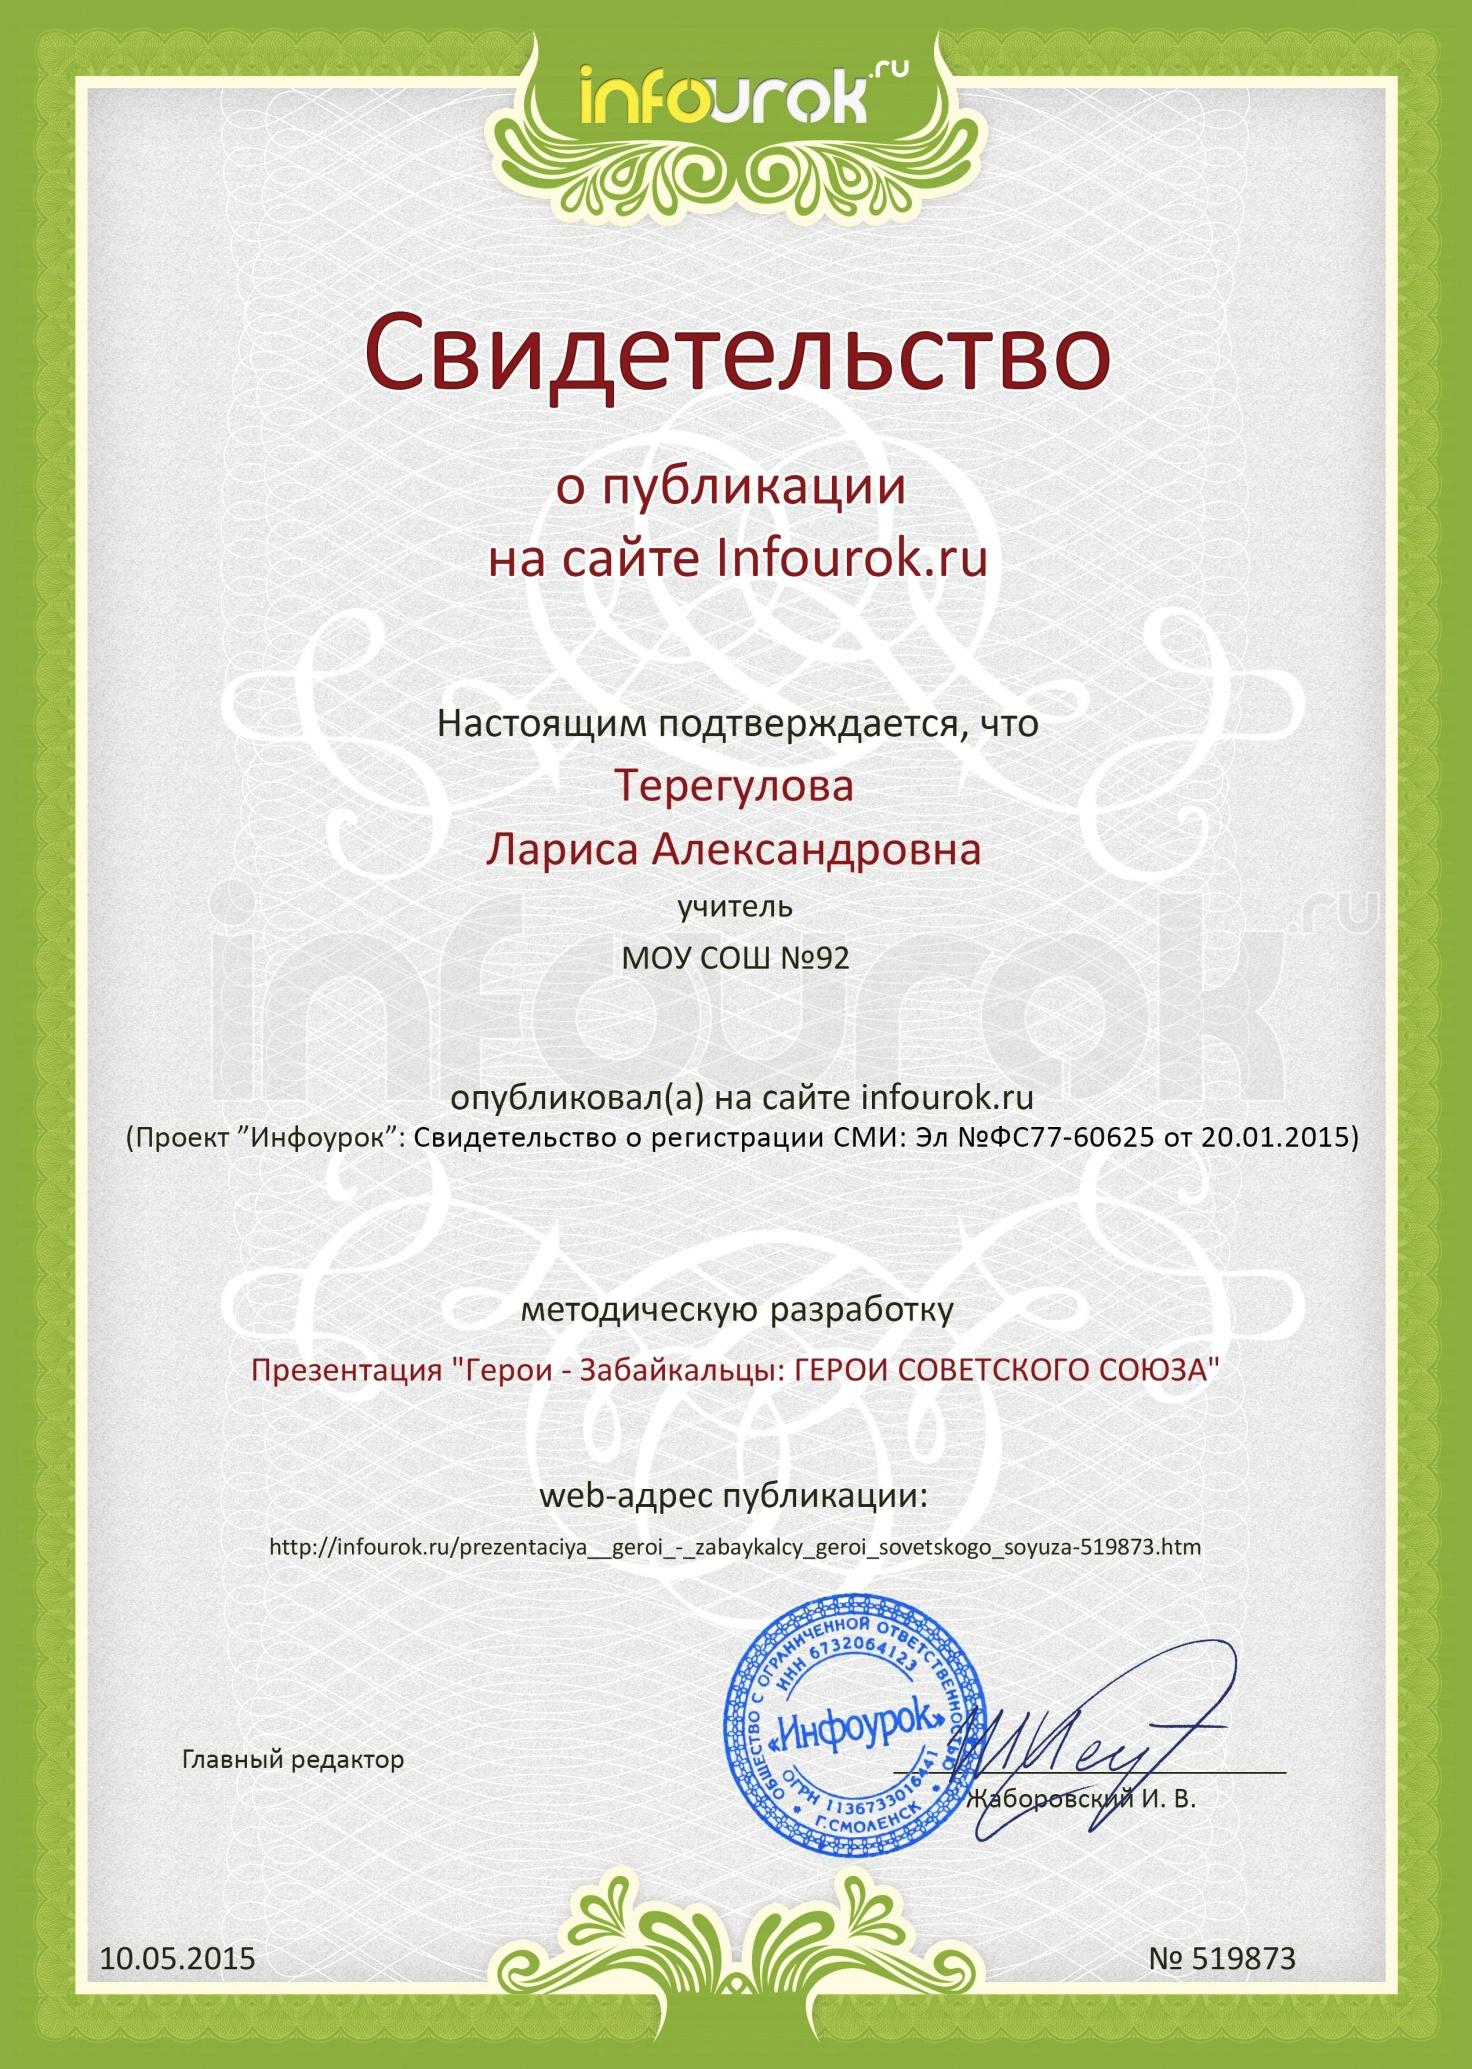 Сертификат проекта infourok.ru № 519873.jpg